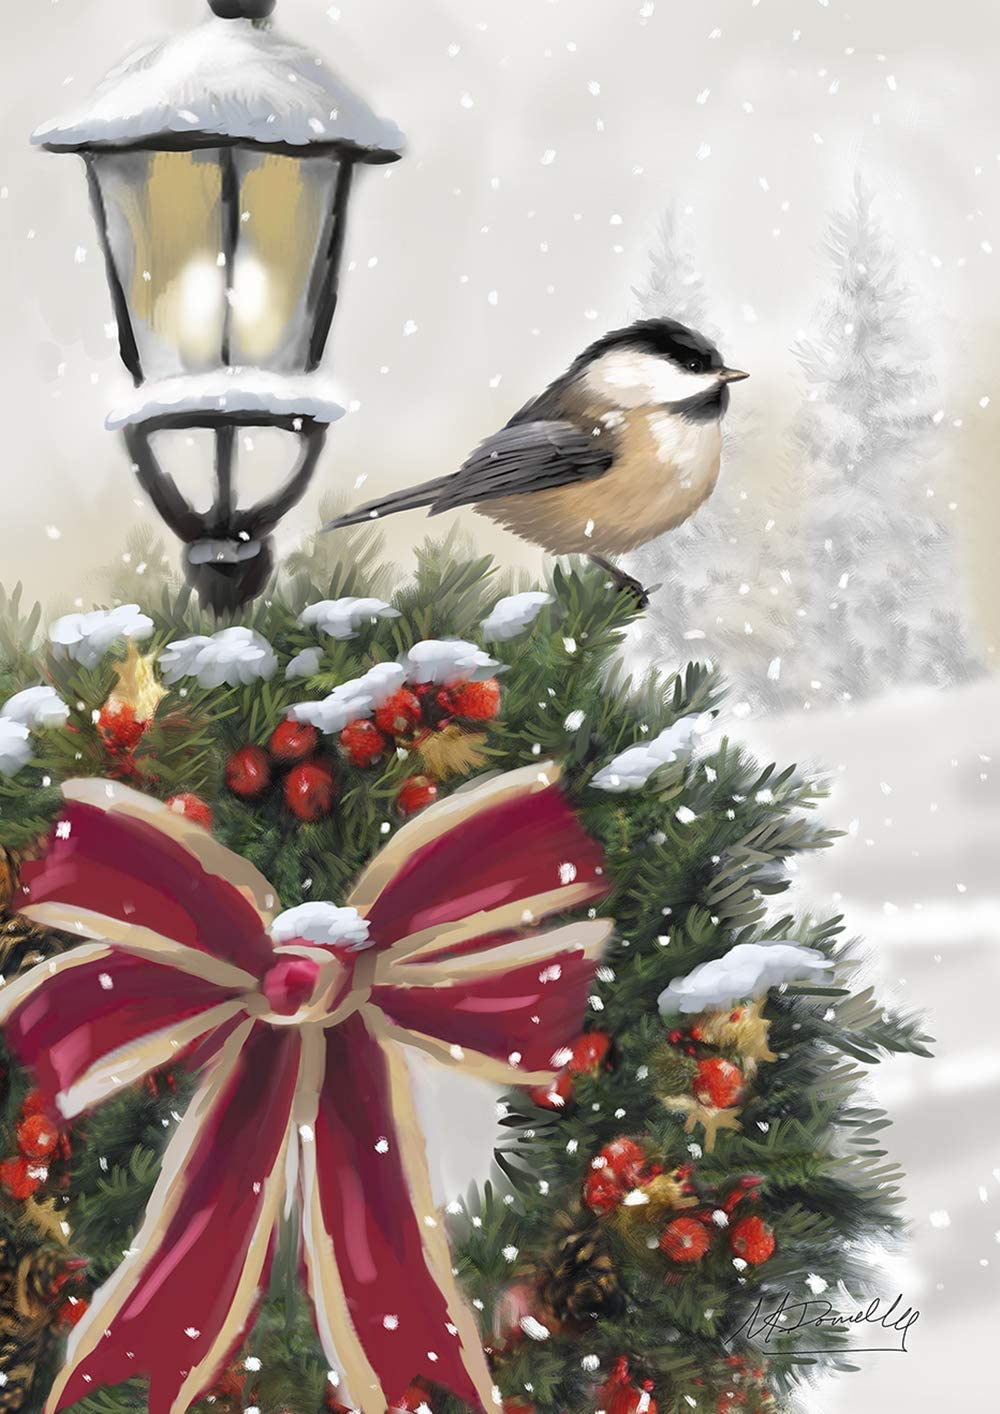 Toland Home Garden 1012270 Snowy Wreath House Flag (28 x 40-Inch), Winter Christmas Chickadee, Multi